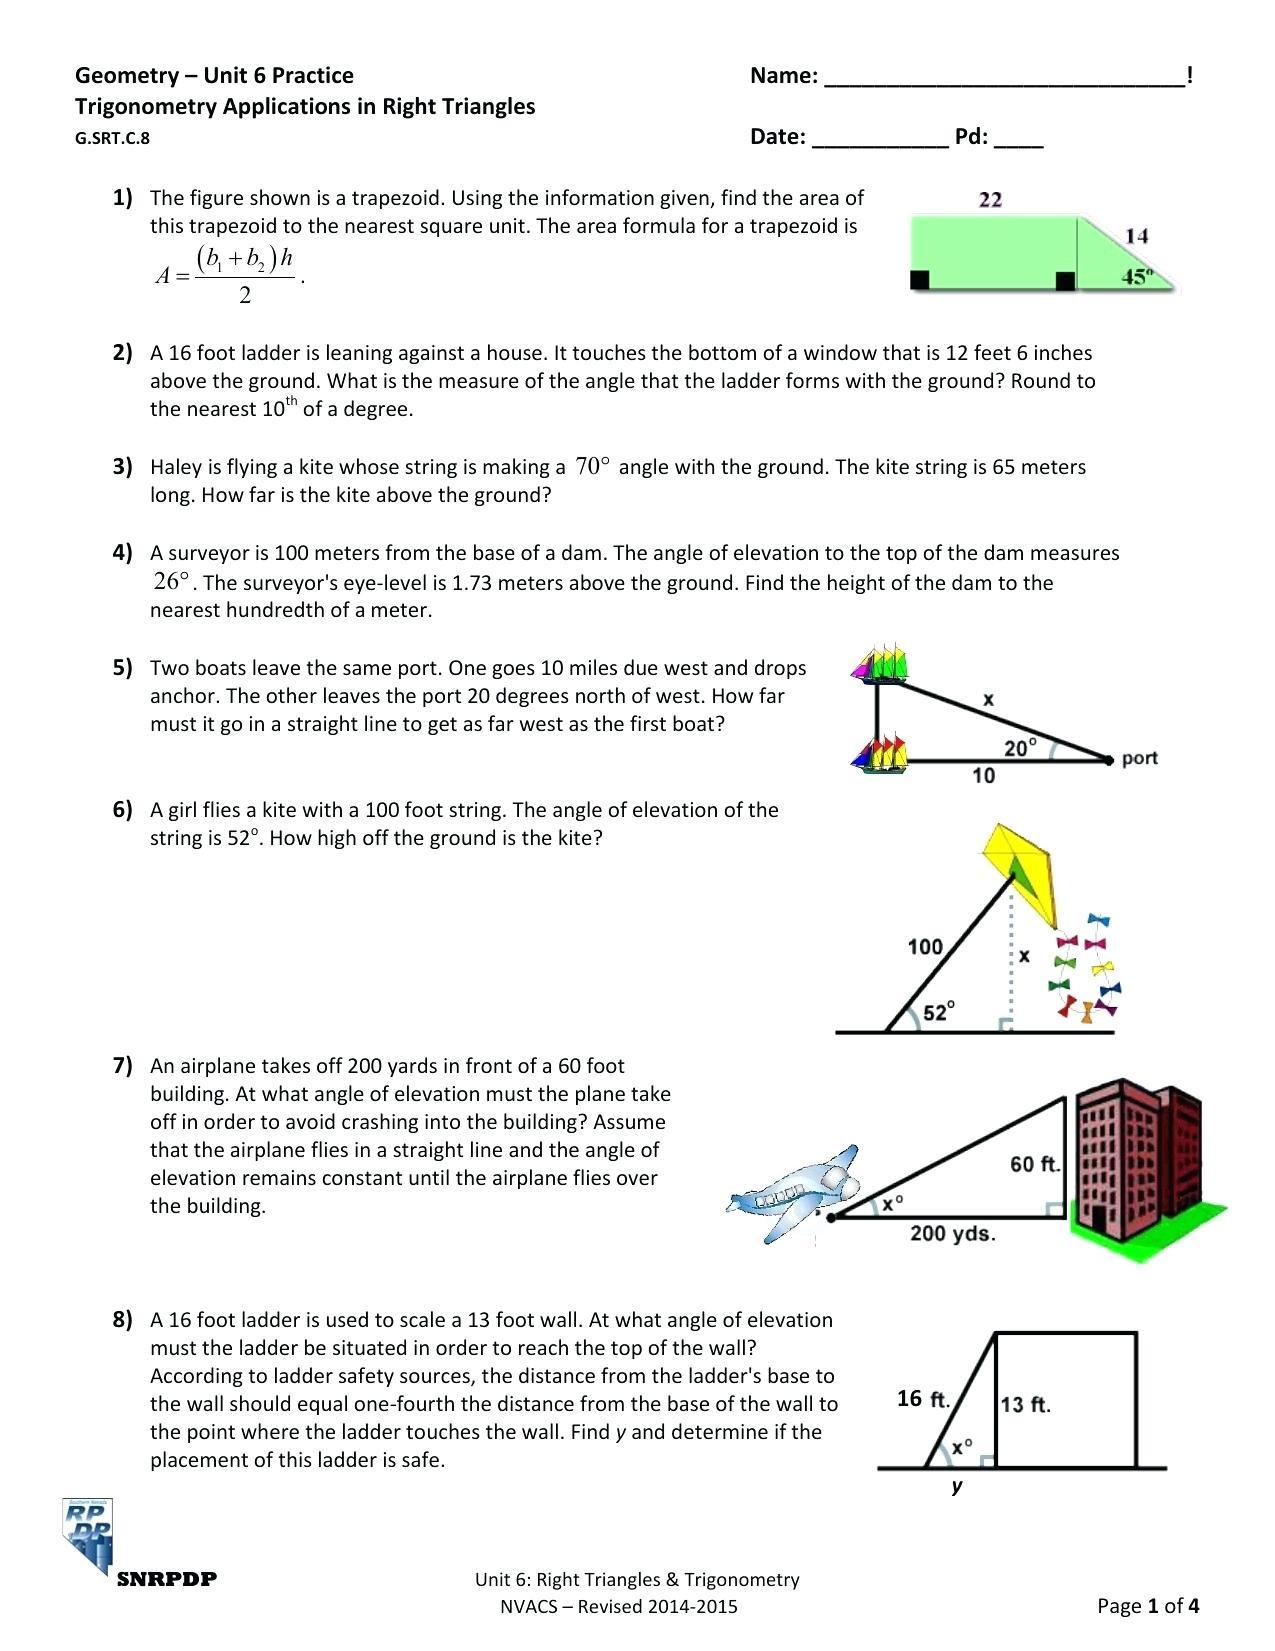 30 Trigonometry Word Problems Worksheet Answers